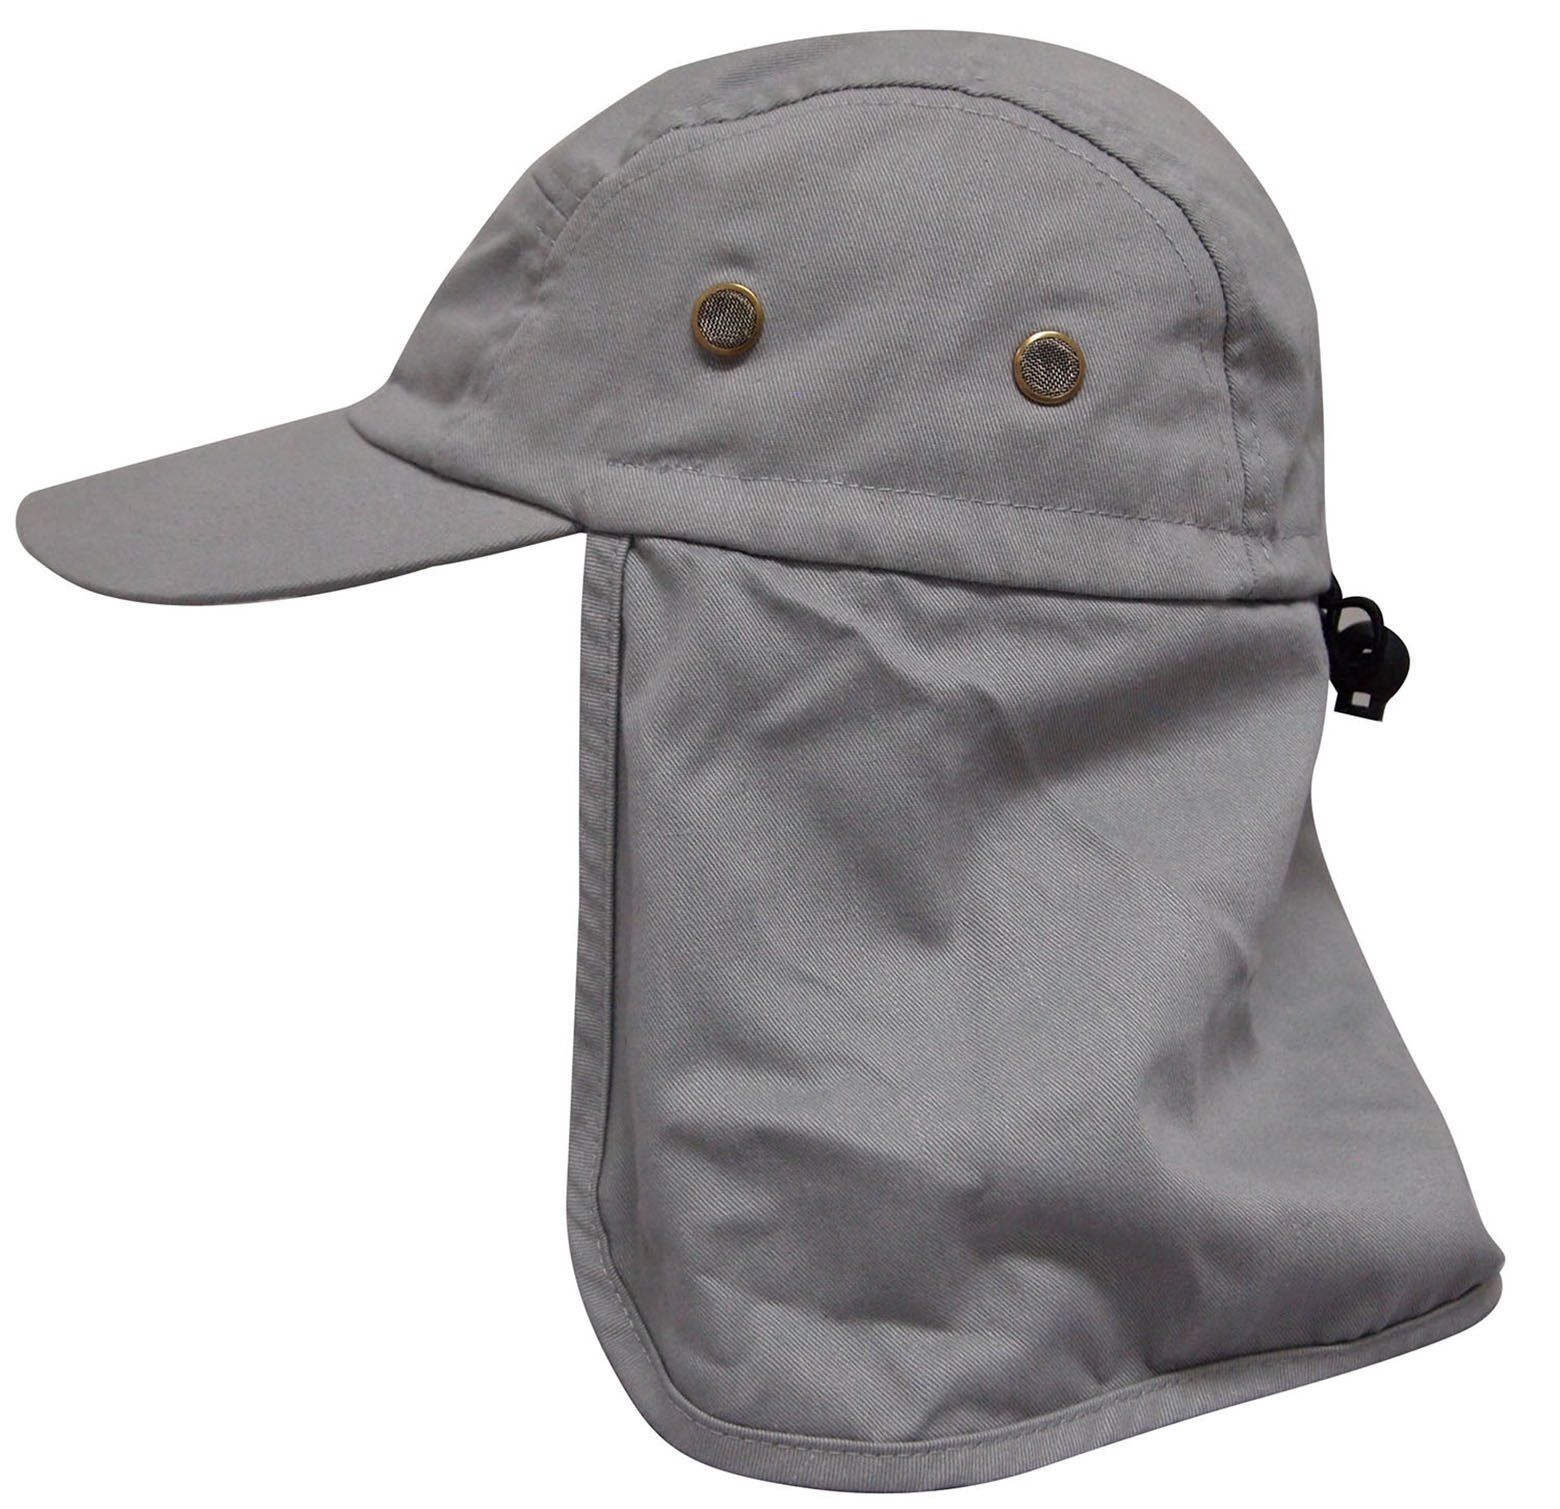 AshopZ Ear Flap Caps Sun Protection Outdoor Neck Shade Hat, Grey